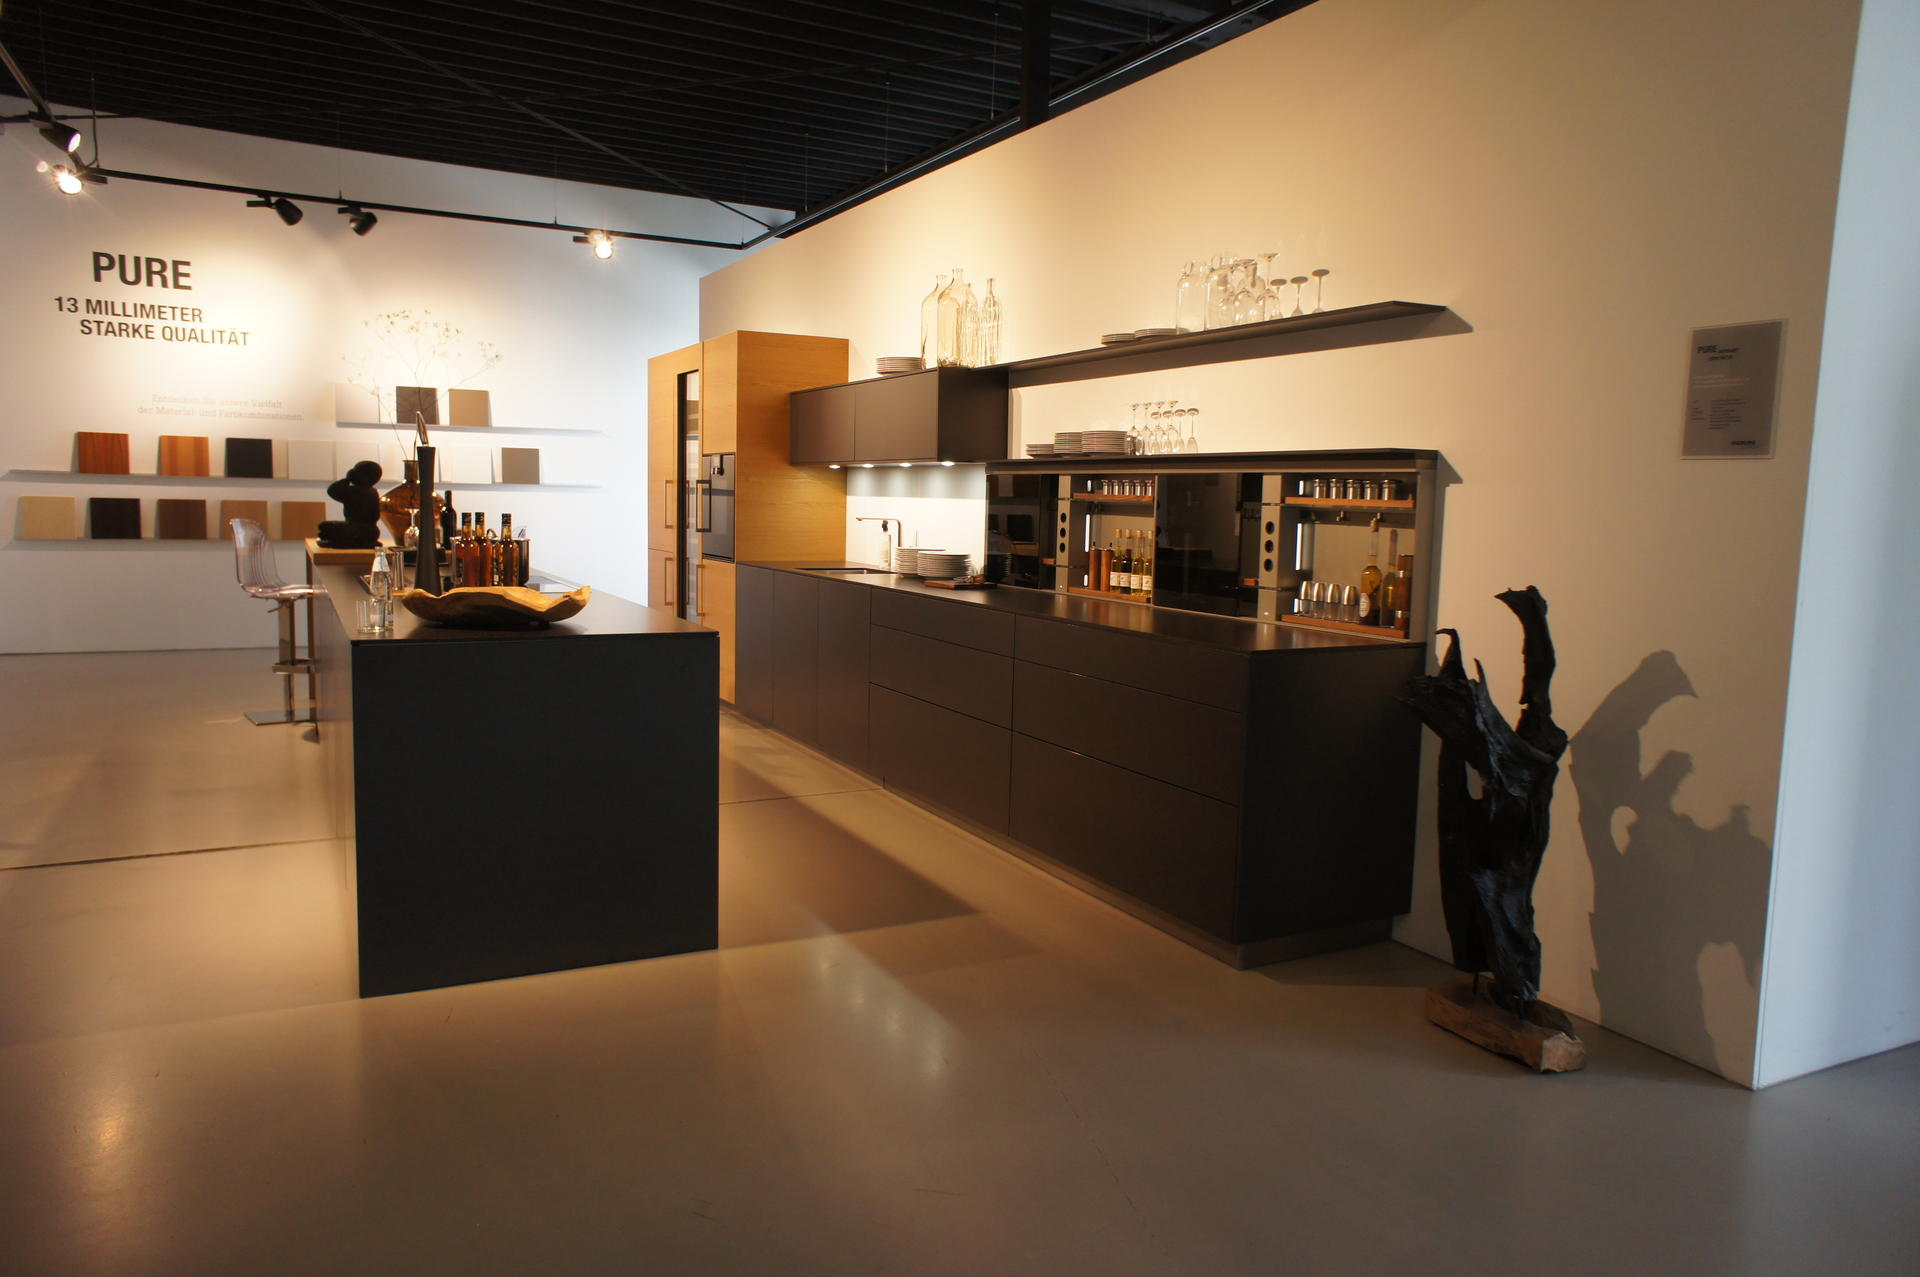 Кухня Nieburg PURE фото 7